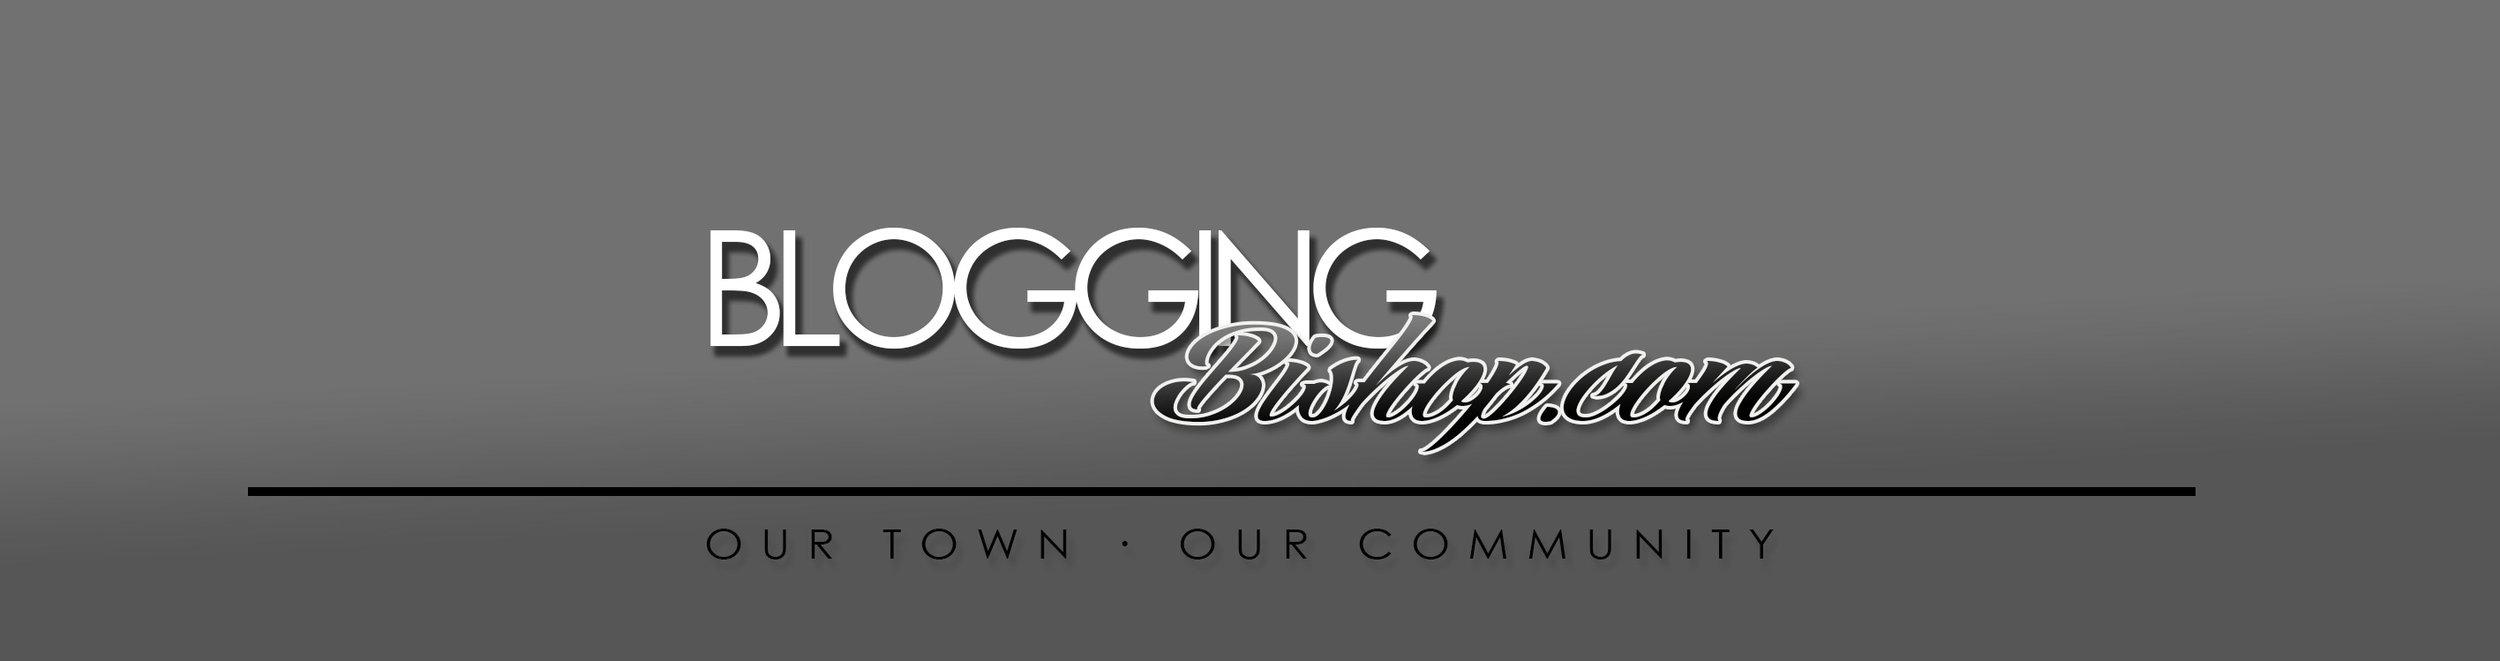 Banner_BloggingBishop_2018Gray.jpg